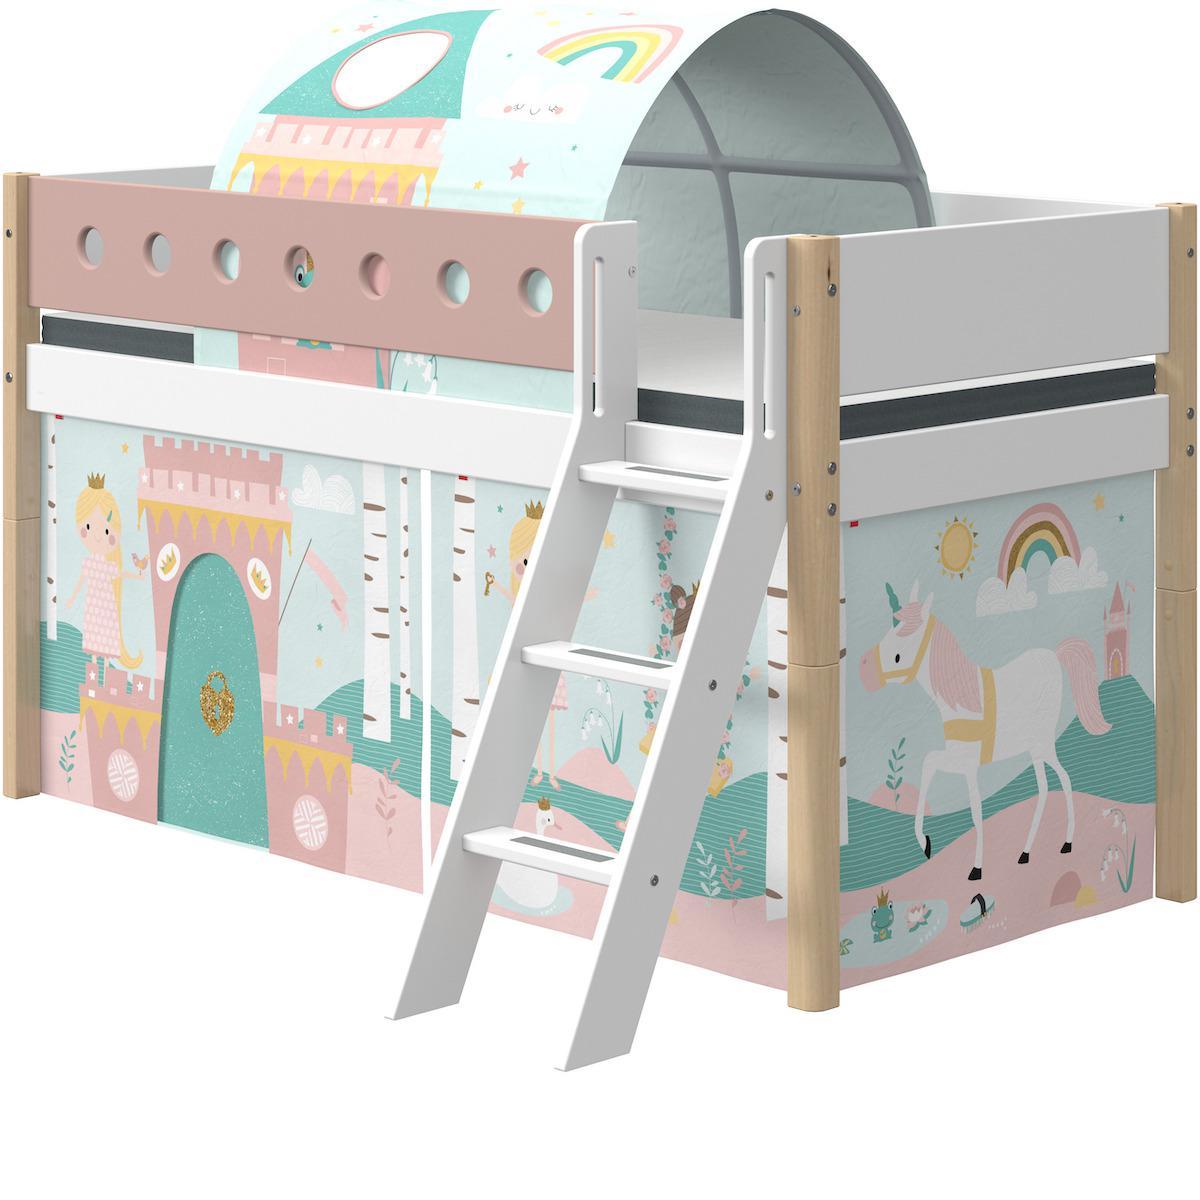 Cama media alta 90x190cm escalera inclinada WHITE Flexa natural-rosa claro